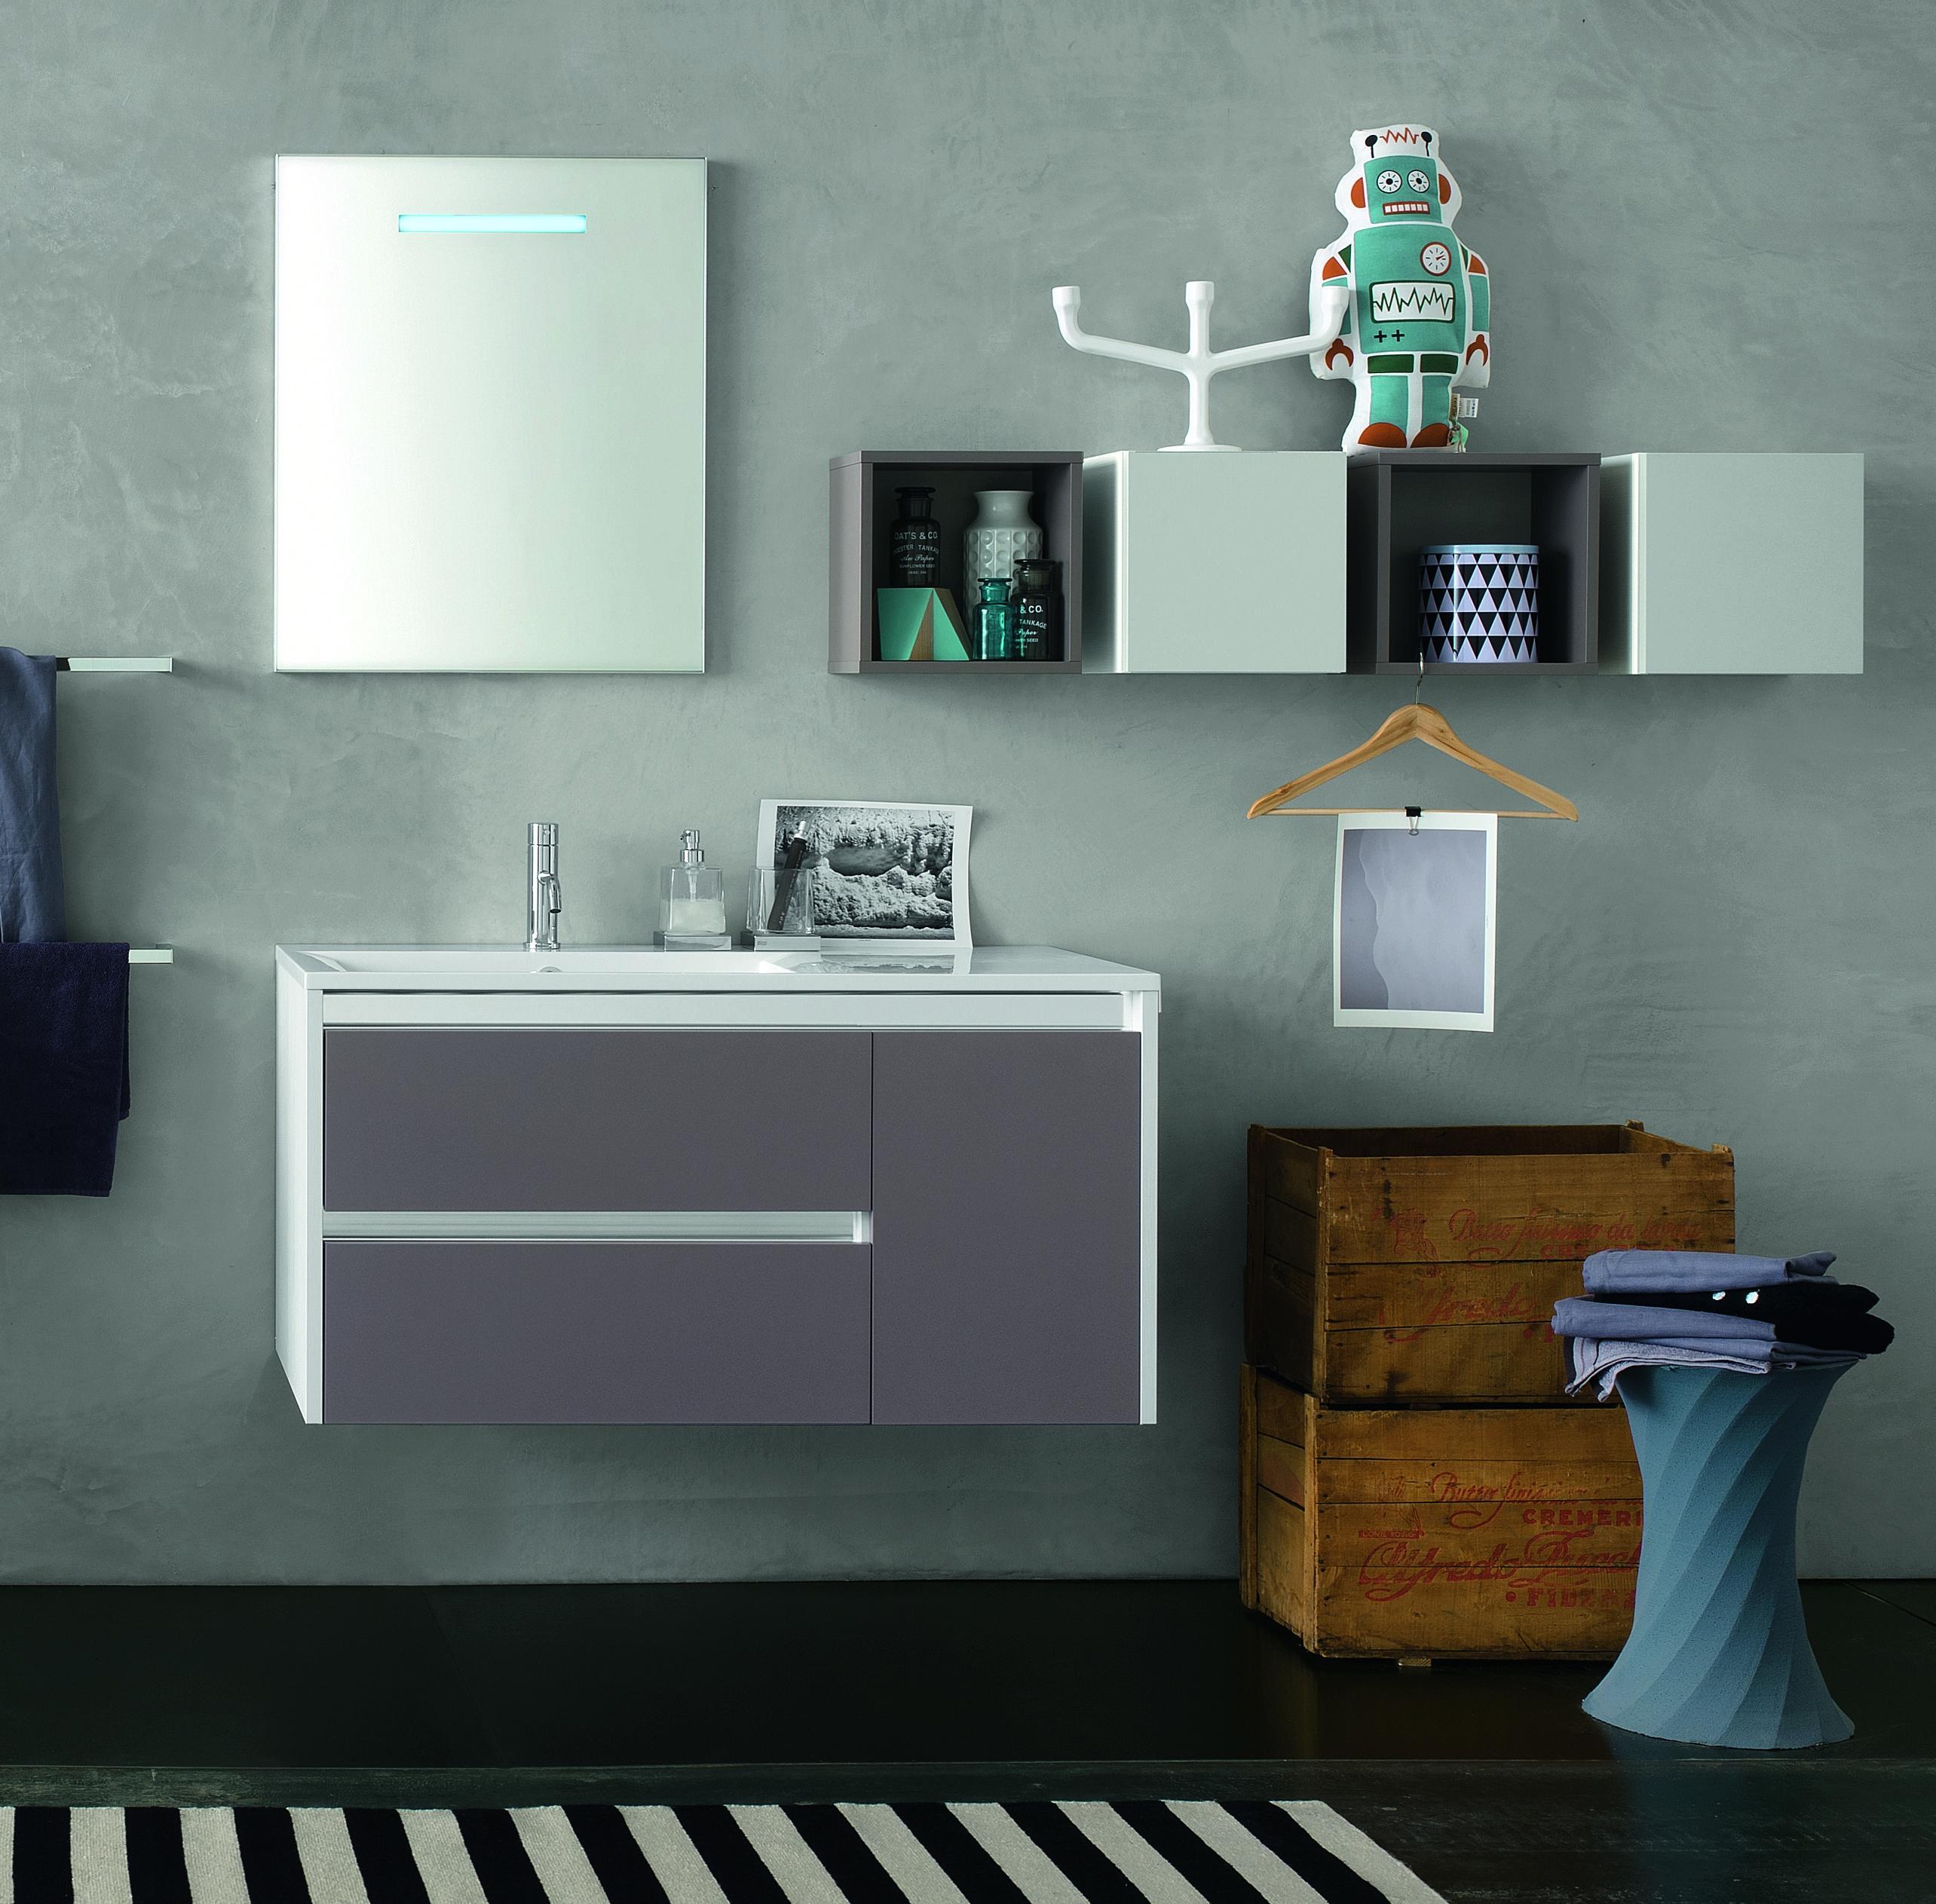 Meuble Avec Vasque Coloris Terra Di Luna Brillant Et Miroir A Led